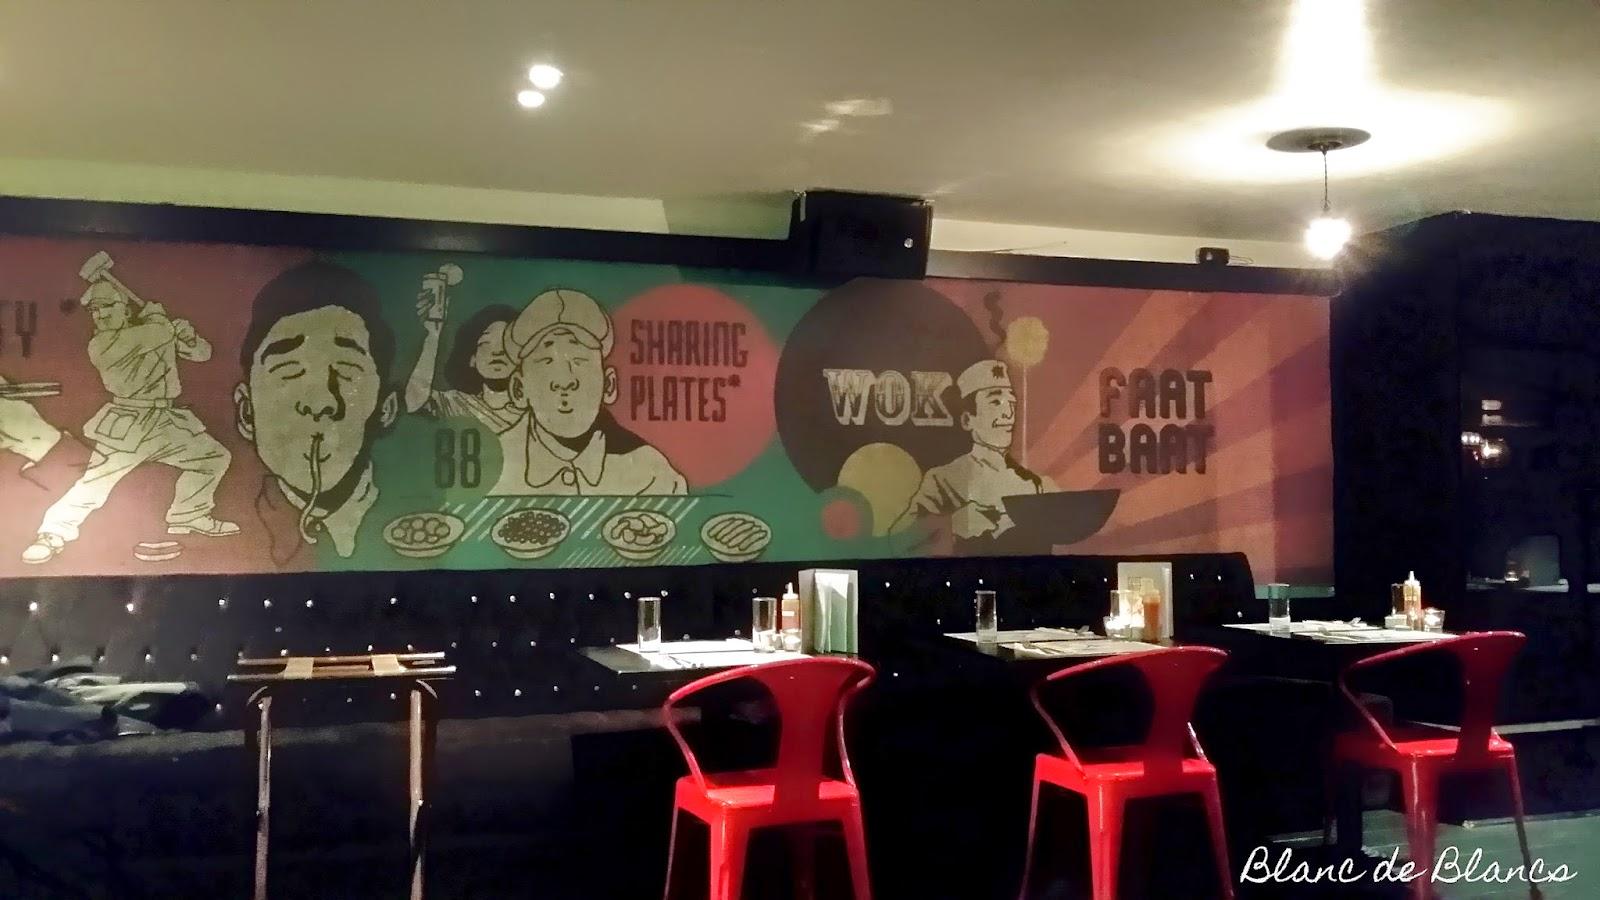 Faat Baat -ravintola Dublinissa - www.blancdeblancs.fi